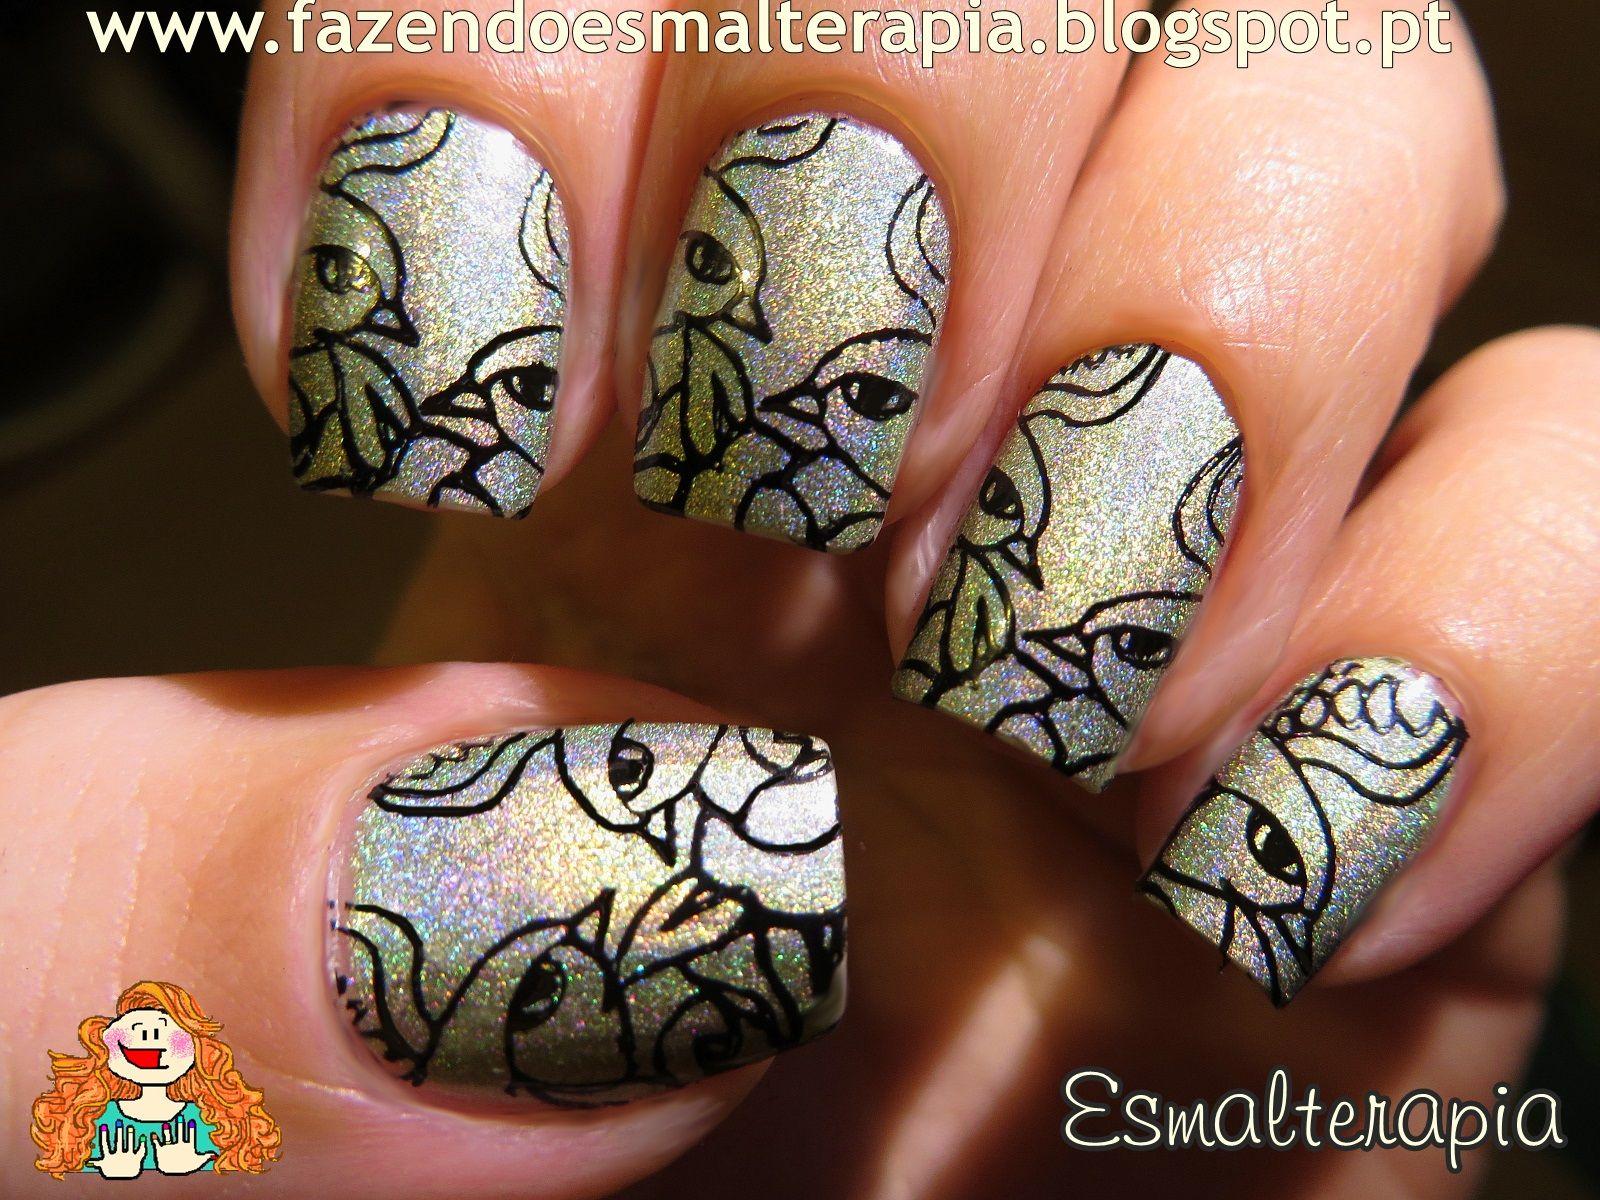 Infinity Nails - 40 | Stamping nailart 3 | Pinterest | Infinity ...